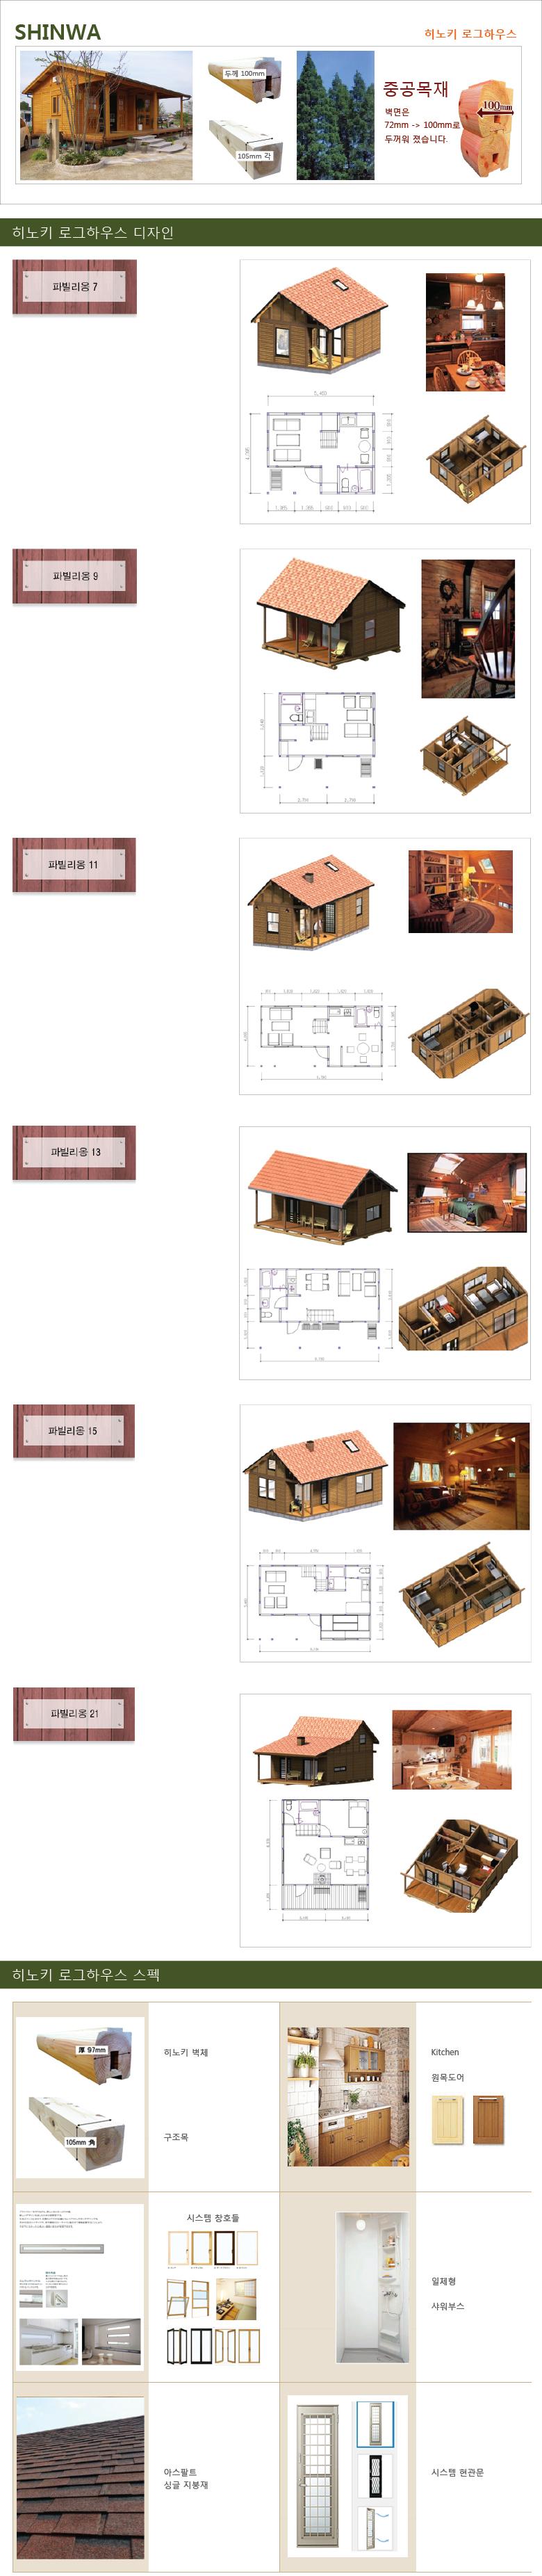 SHINWA_히노끼-하우스-디자인_1.jpg